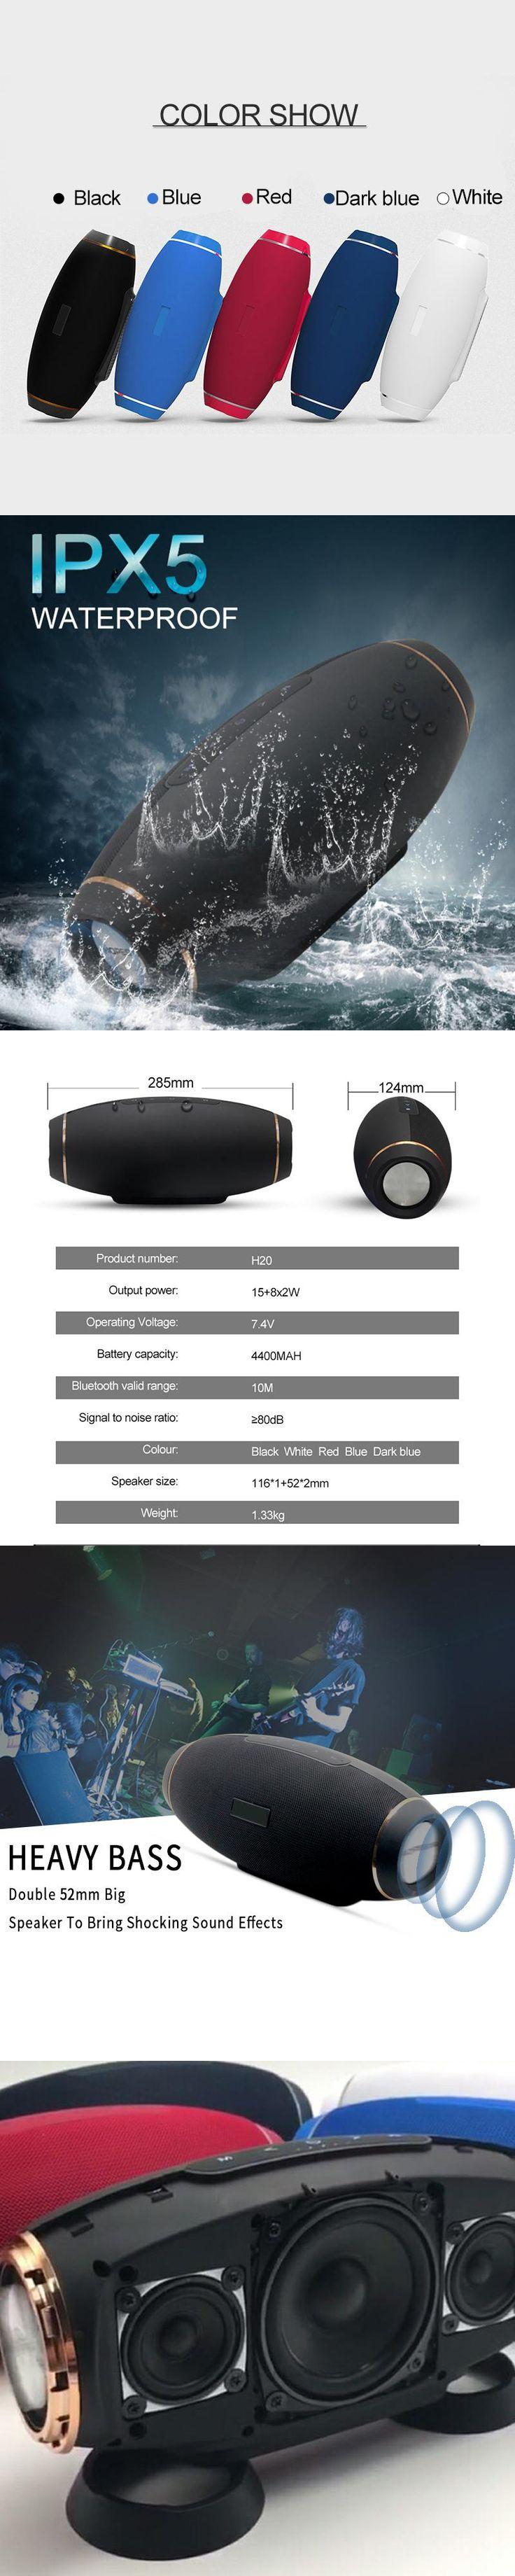 Rugby Portable Splashproof Wireless Bluetooth Speaker Waterproof Outdoor HIFI Bass Subwoofer LoudSpeaker TF AUX Stereo Charge 3